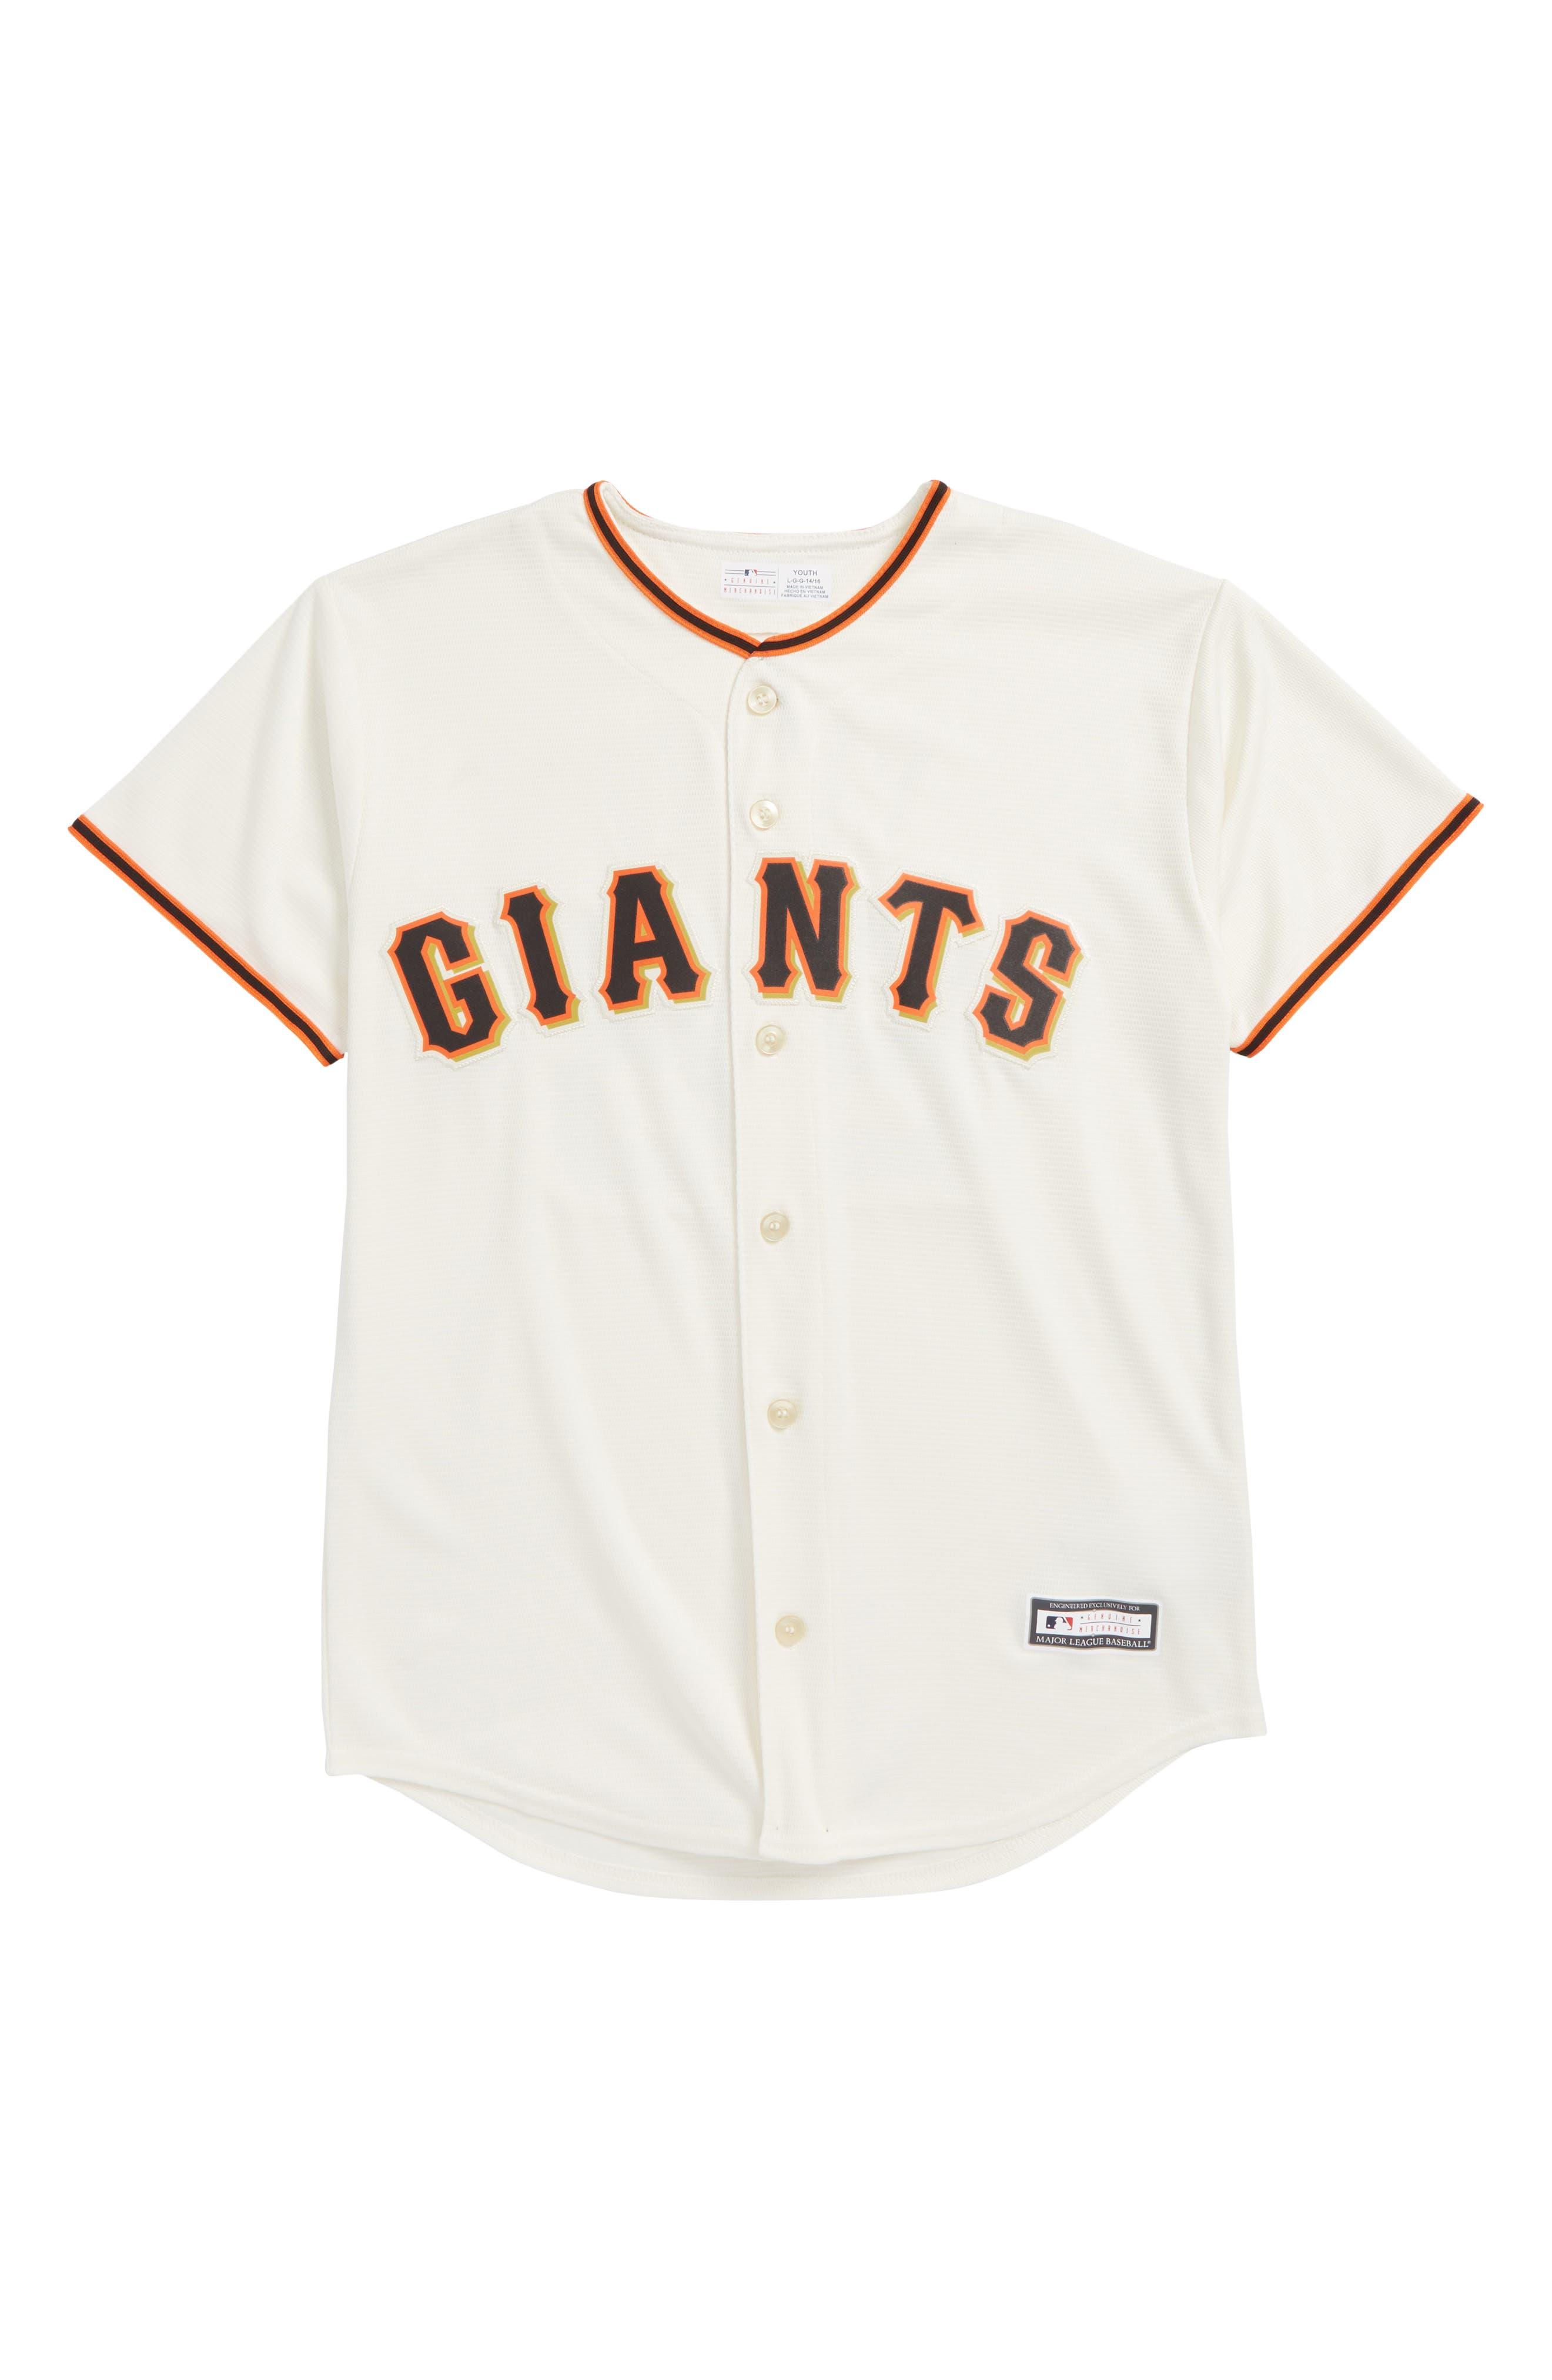 San Francisco Giants - Buster Posey Baseball Jersey,                             Main thumbnail 1, color,                             100